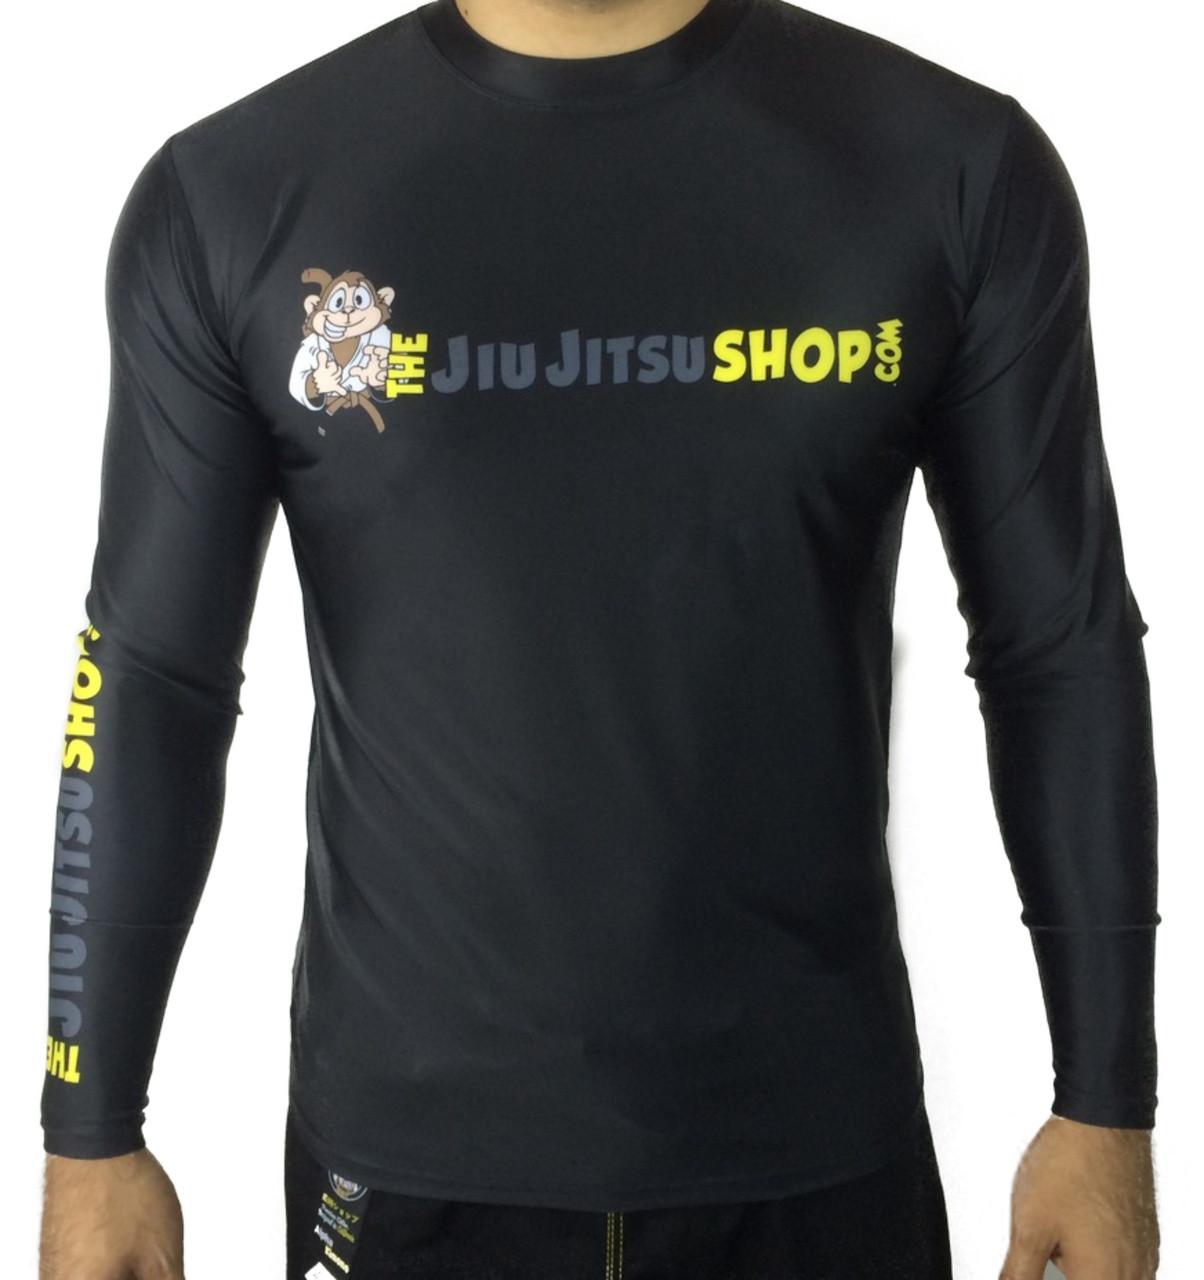 "The Jiu Jitsu Shop's ""Essentials"" Long Sleeve Rashguard, featuring our buddy Rocky the Monkey. Exclusively at www.thejiujitsushop.com. Free domestic shipping storewide."